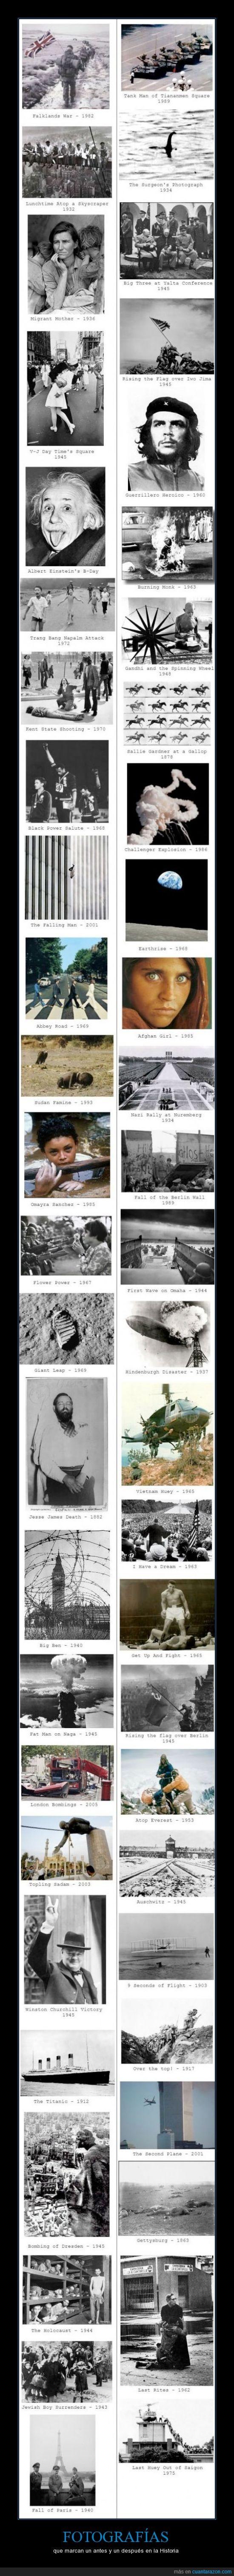 churhil,fotogradia,historia,hitler,national,paris,tanque